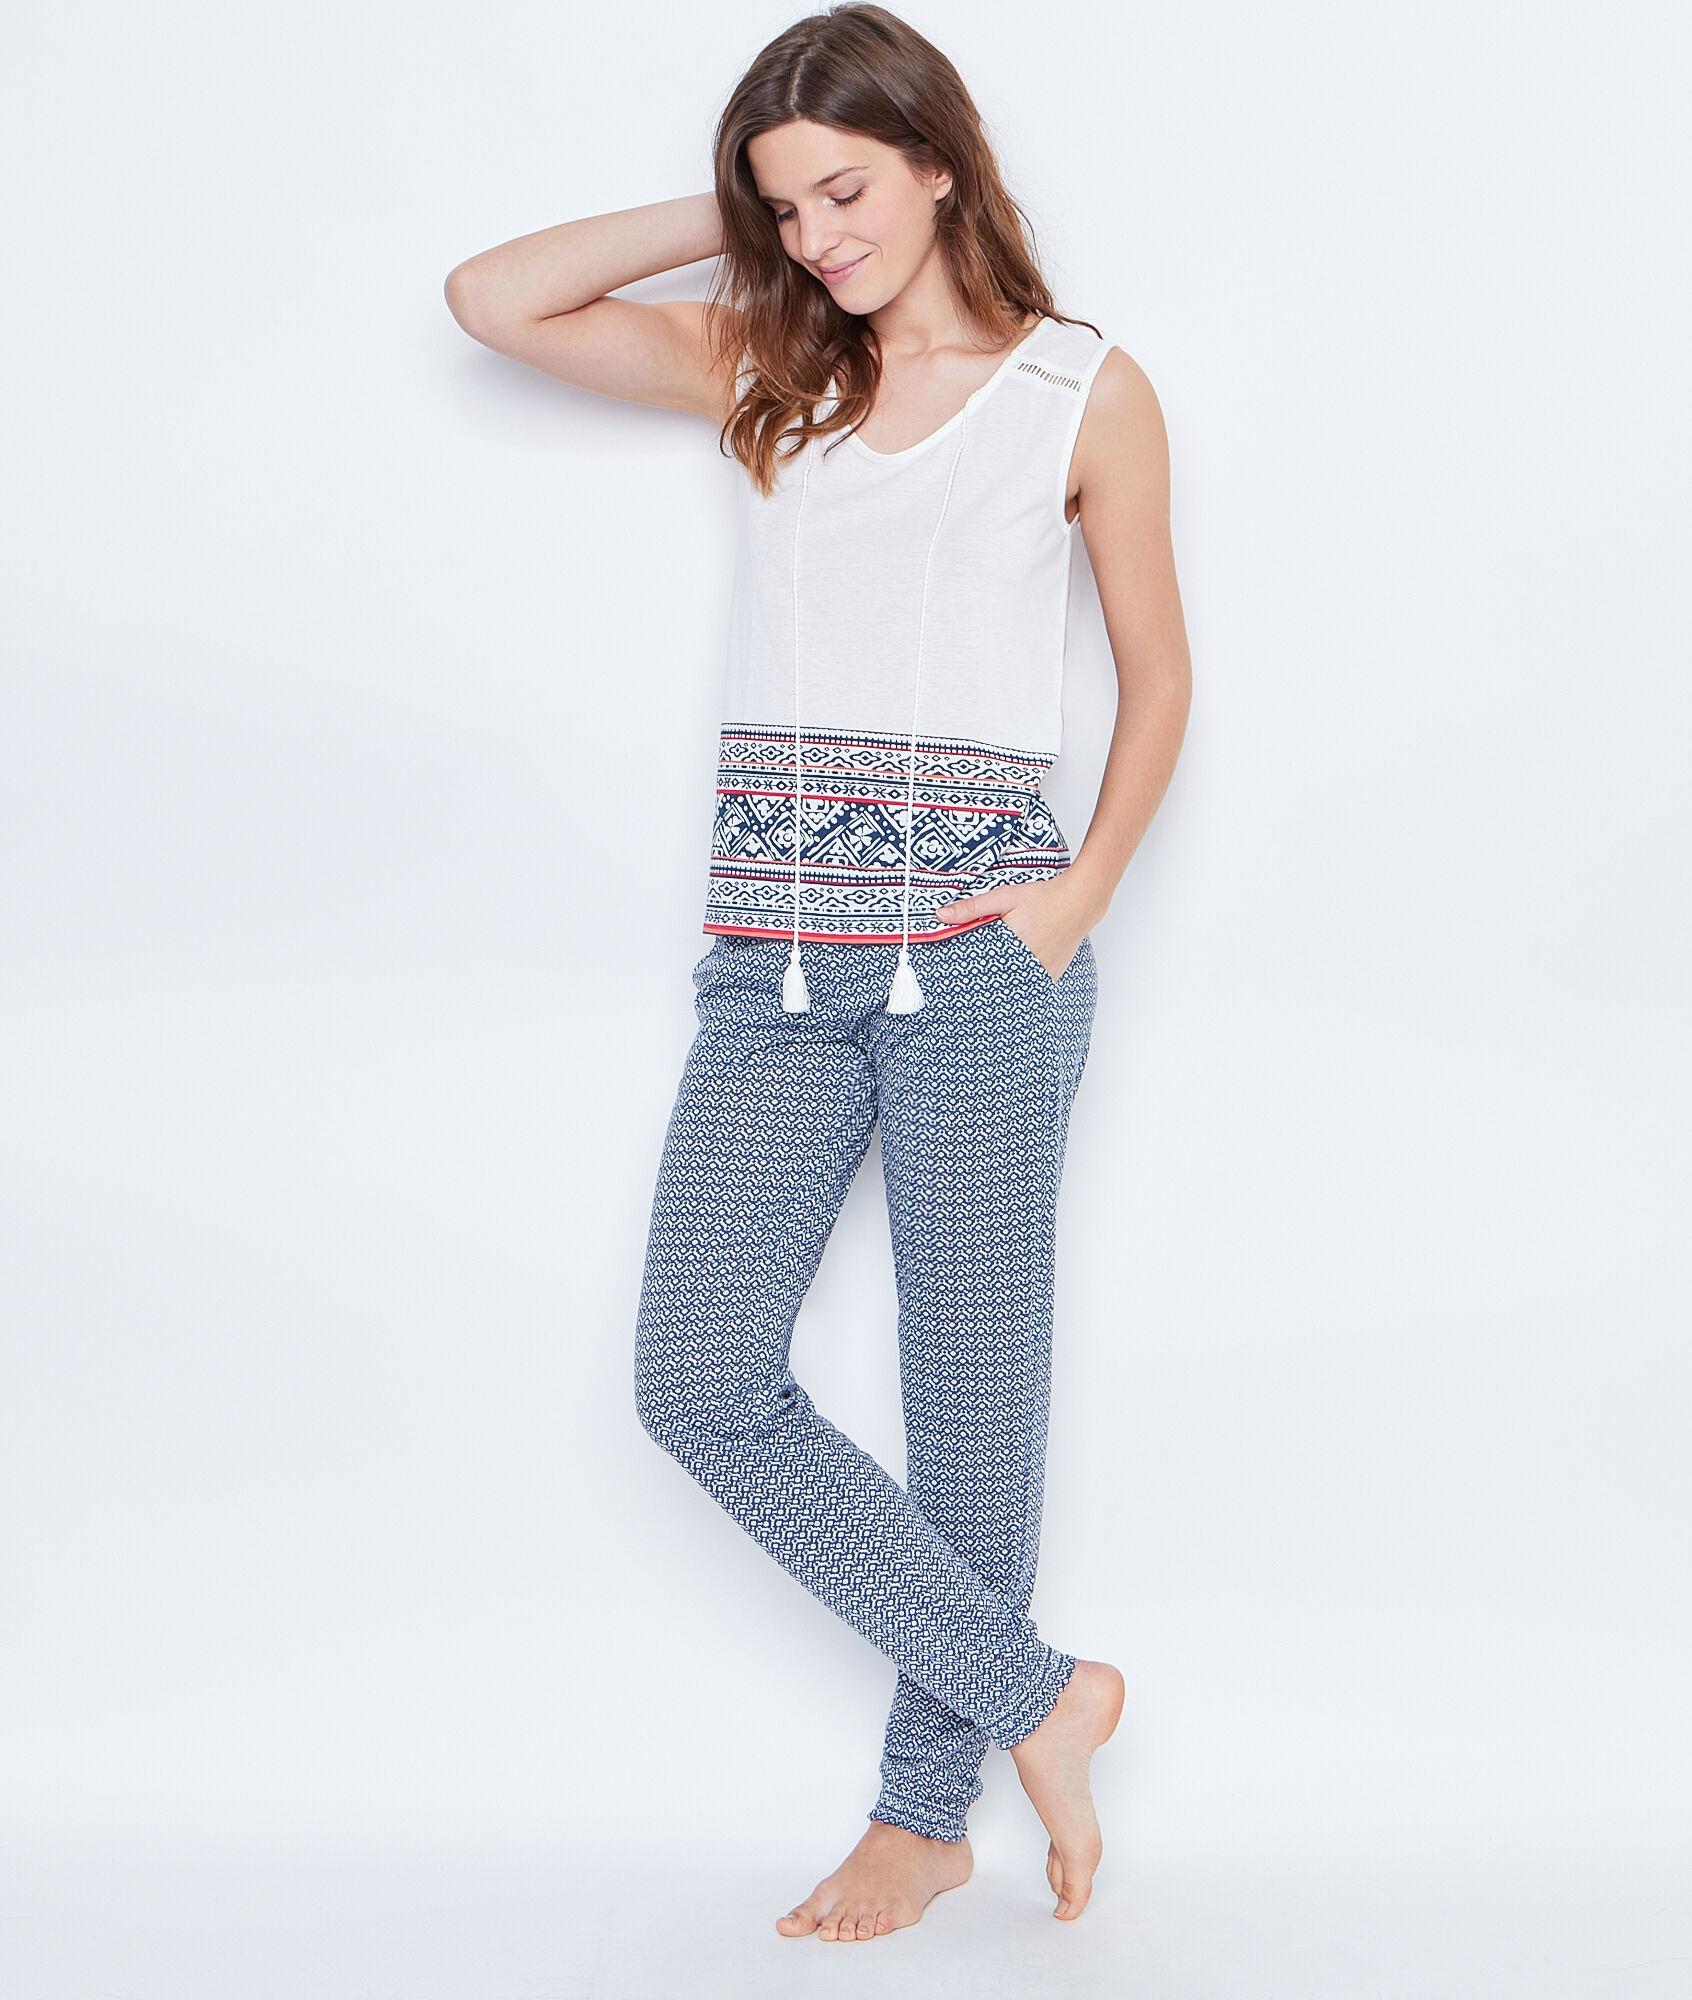 pantalon imprime bleu - Nuisette Mariage Etam